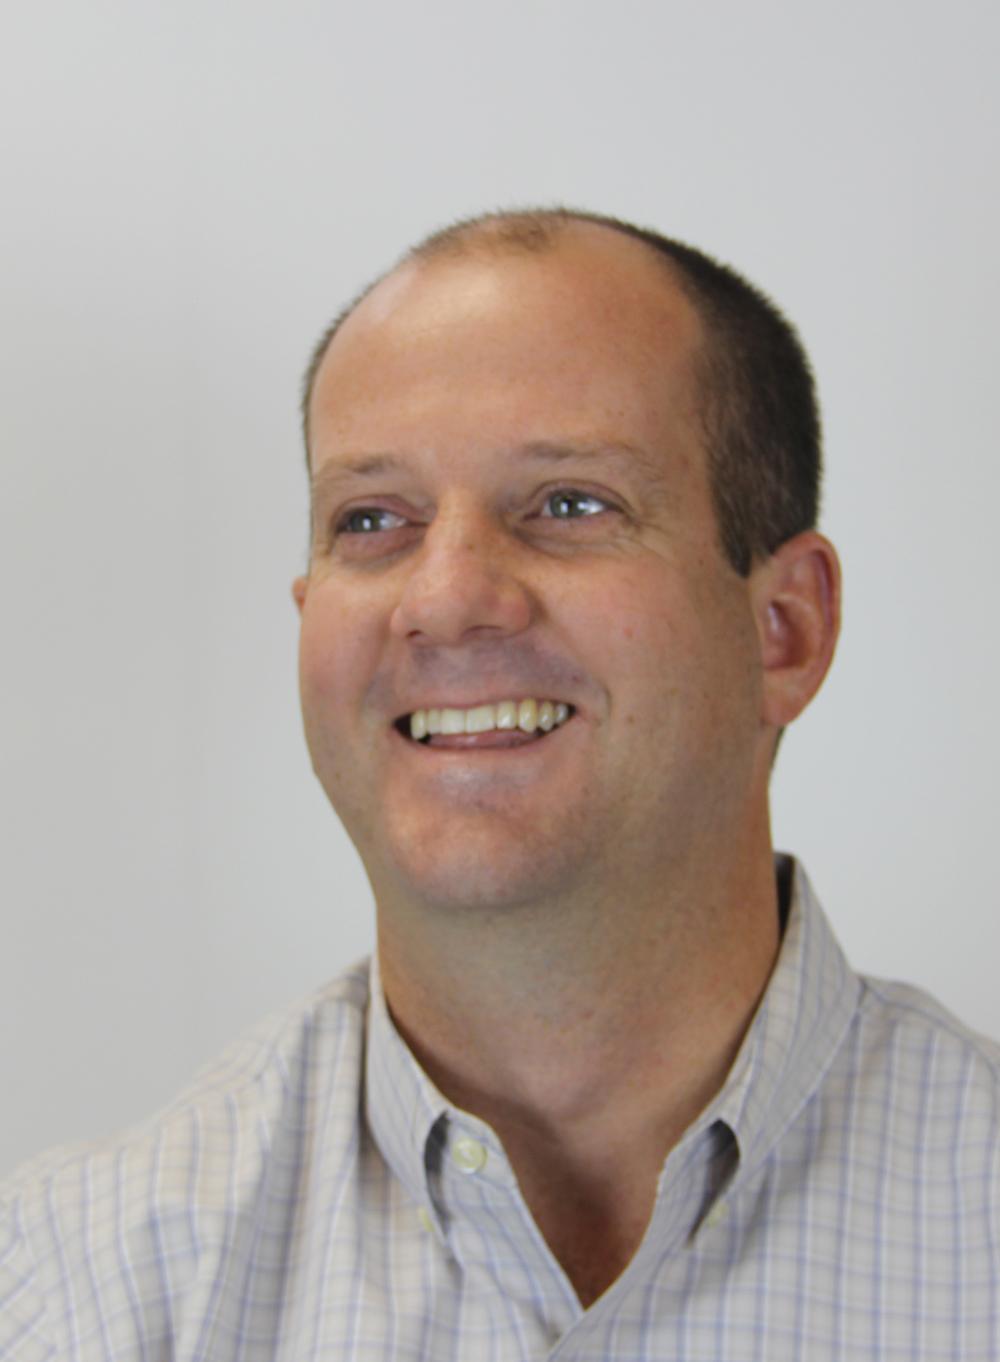 Steve - Architect - Principal